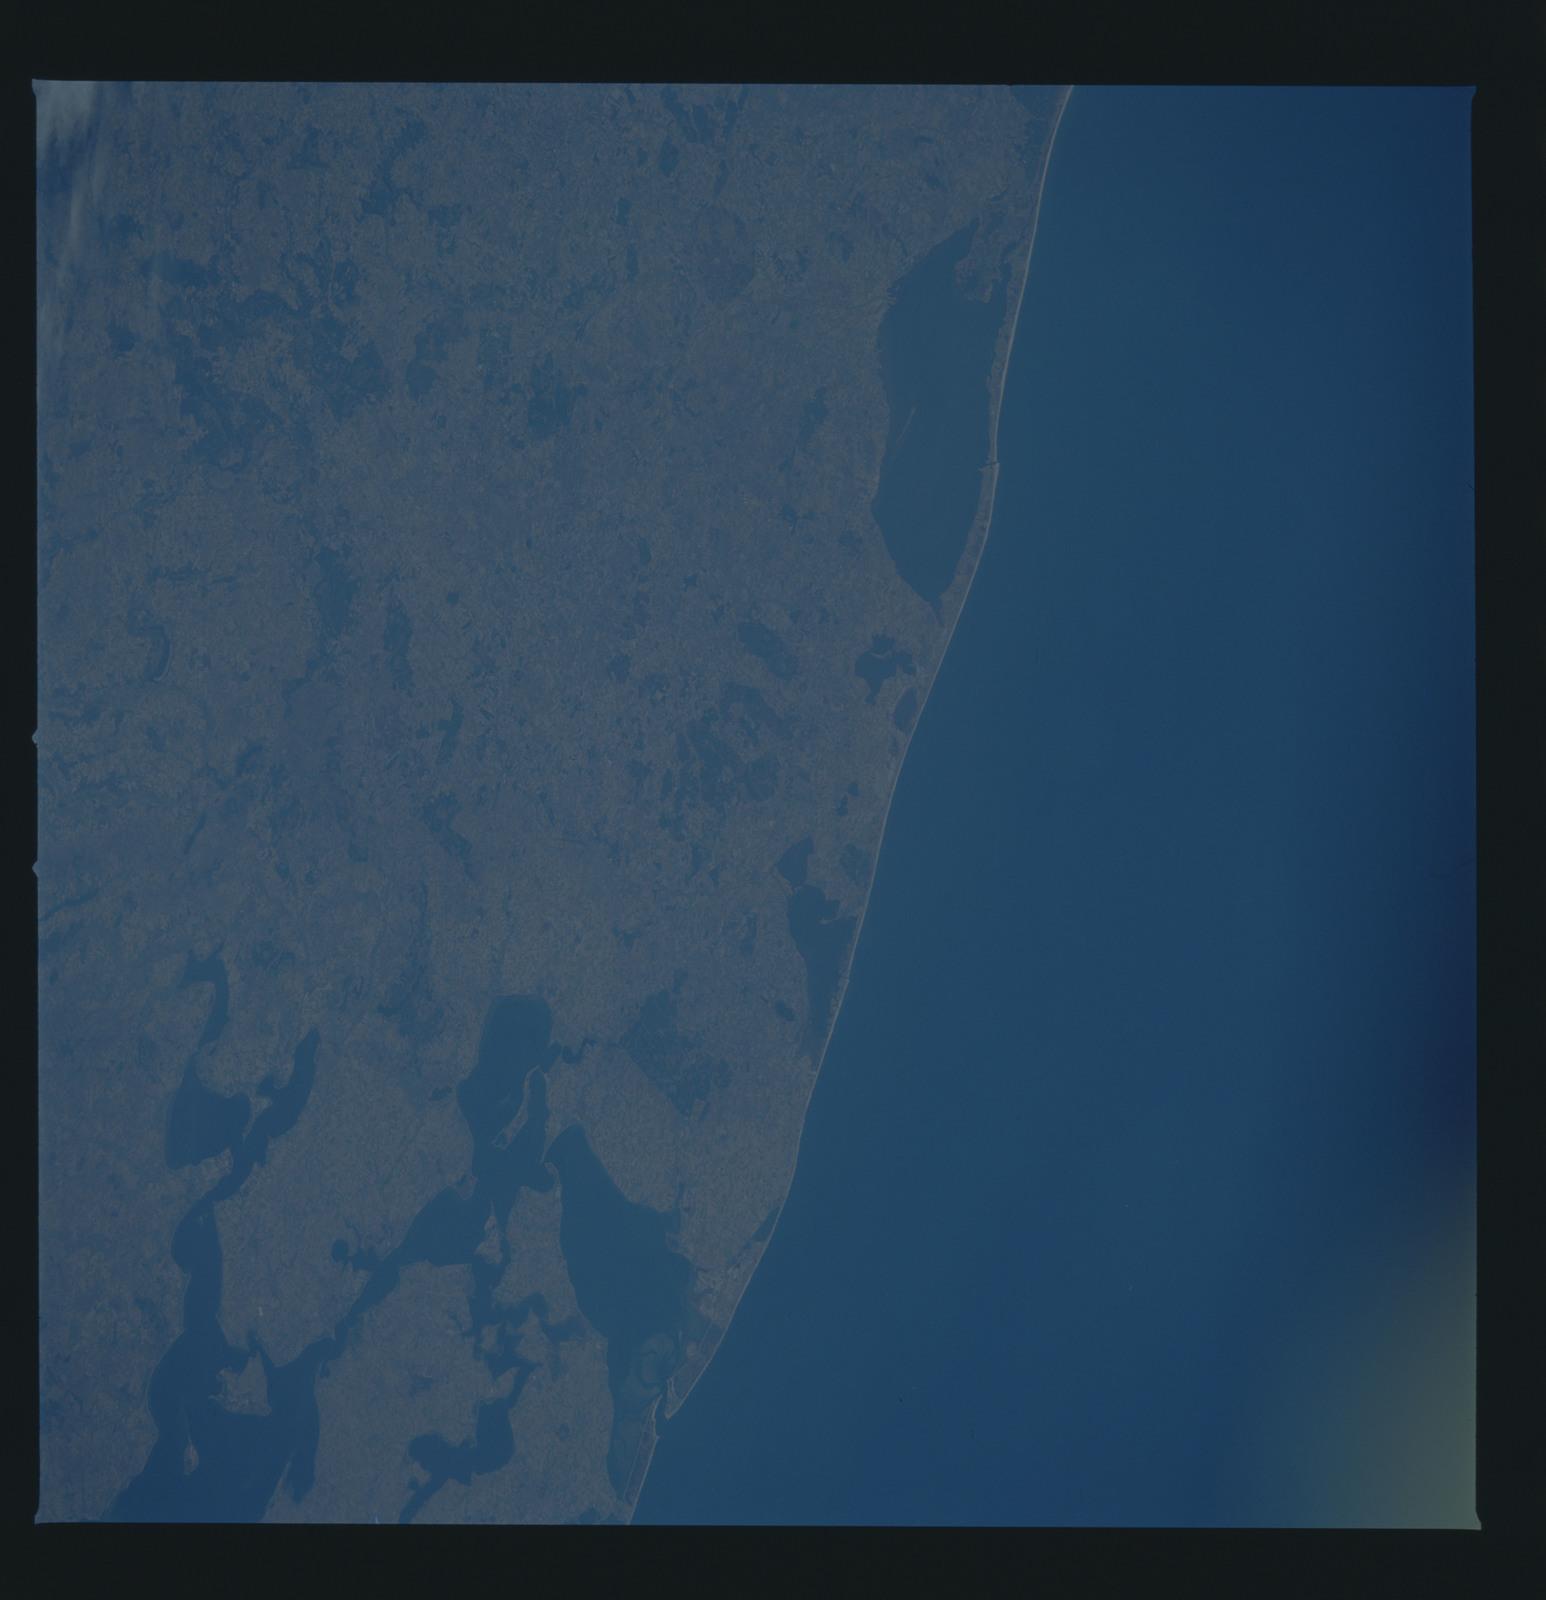 51B-34-010 - STS-51B - 51B earth observation